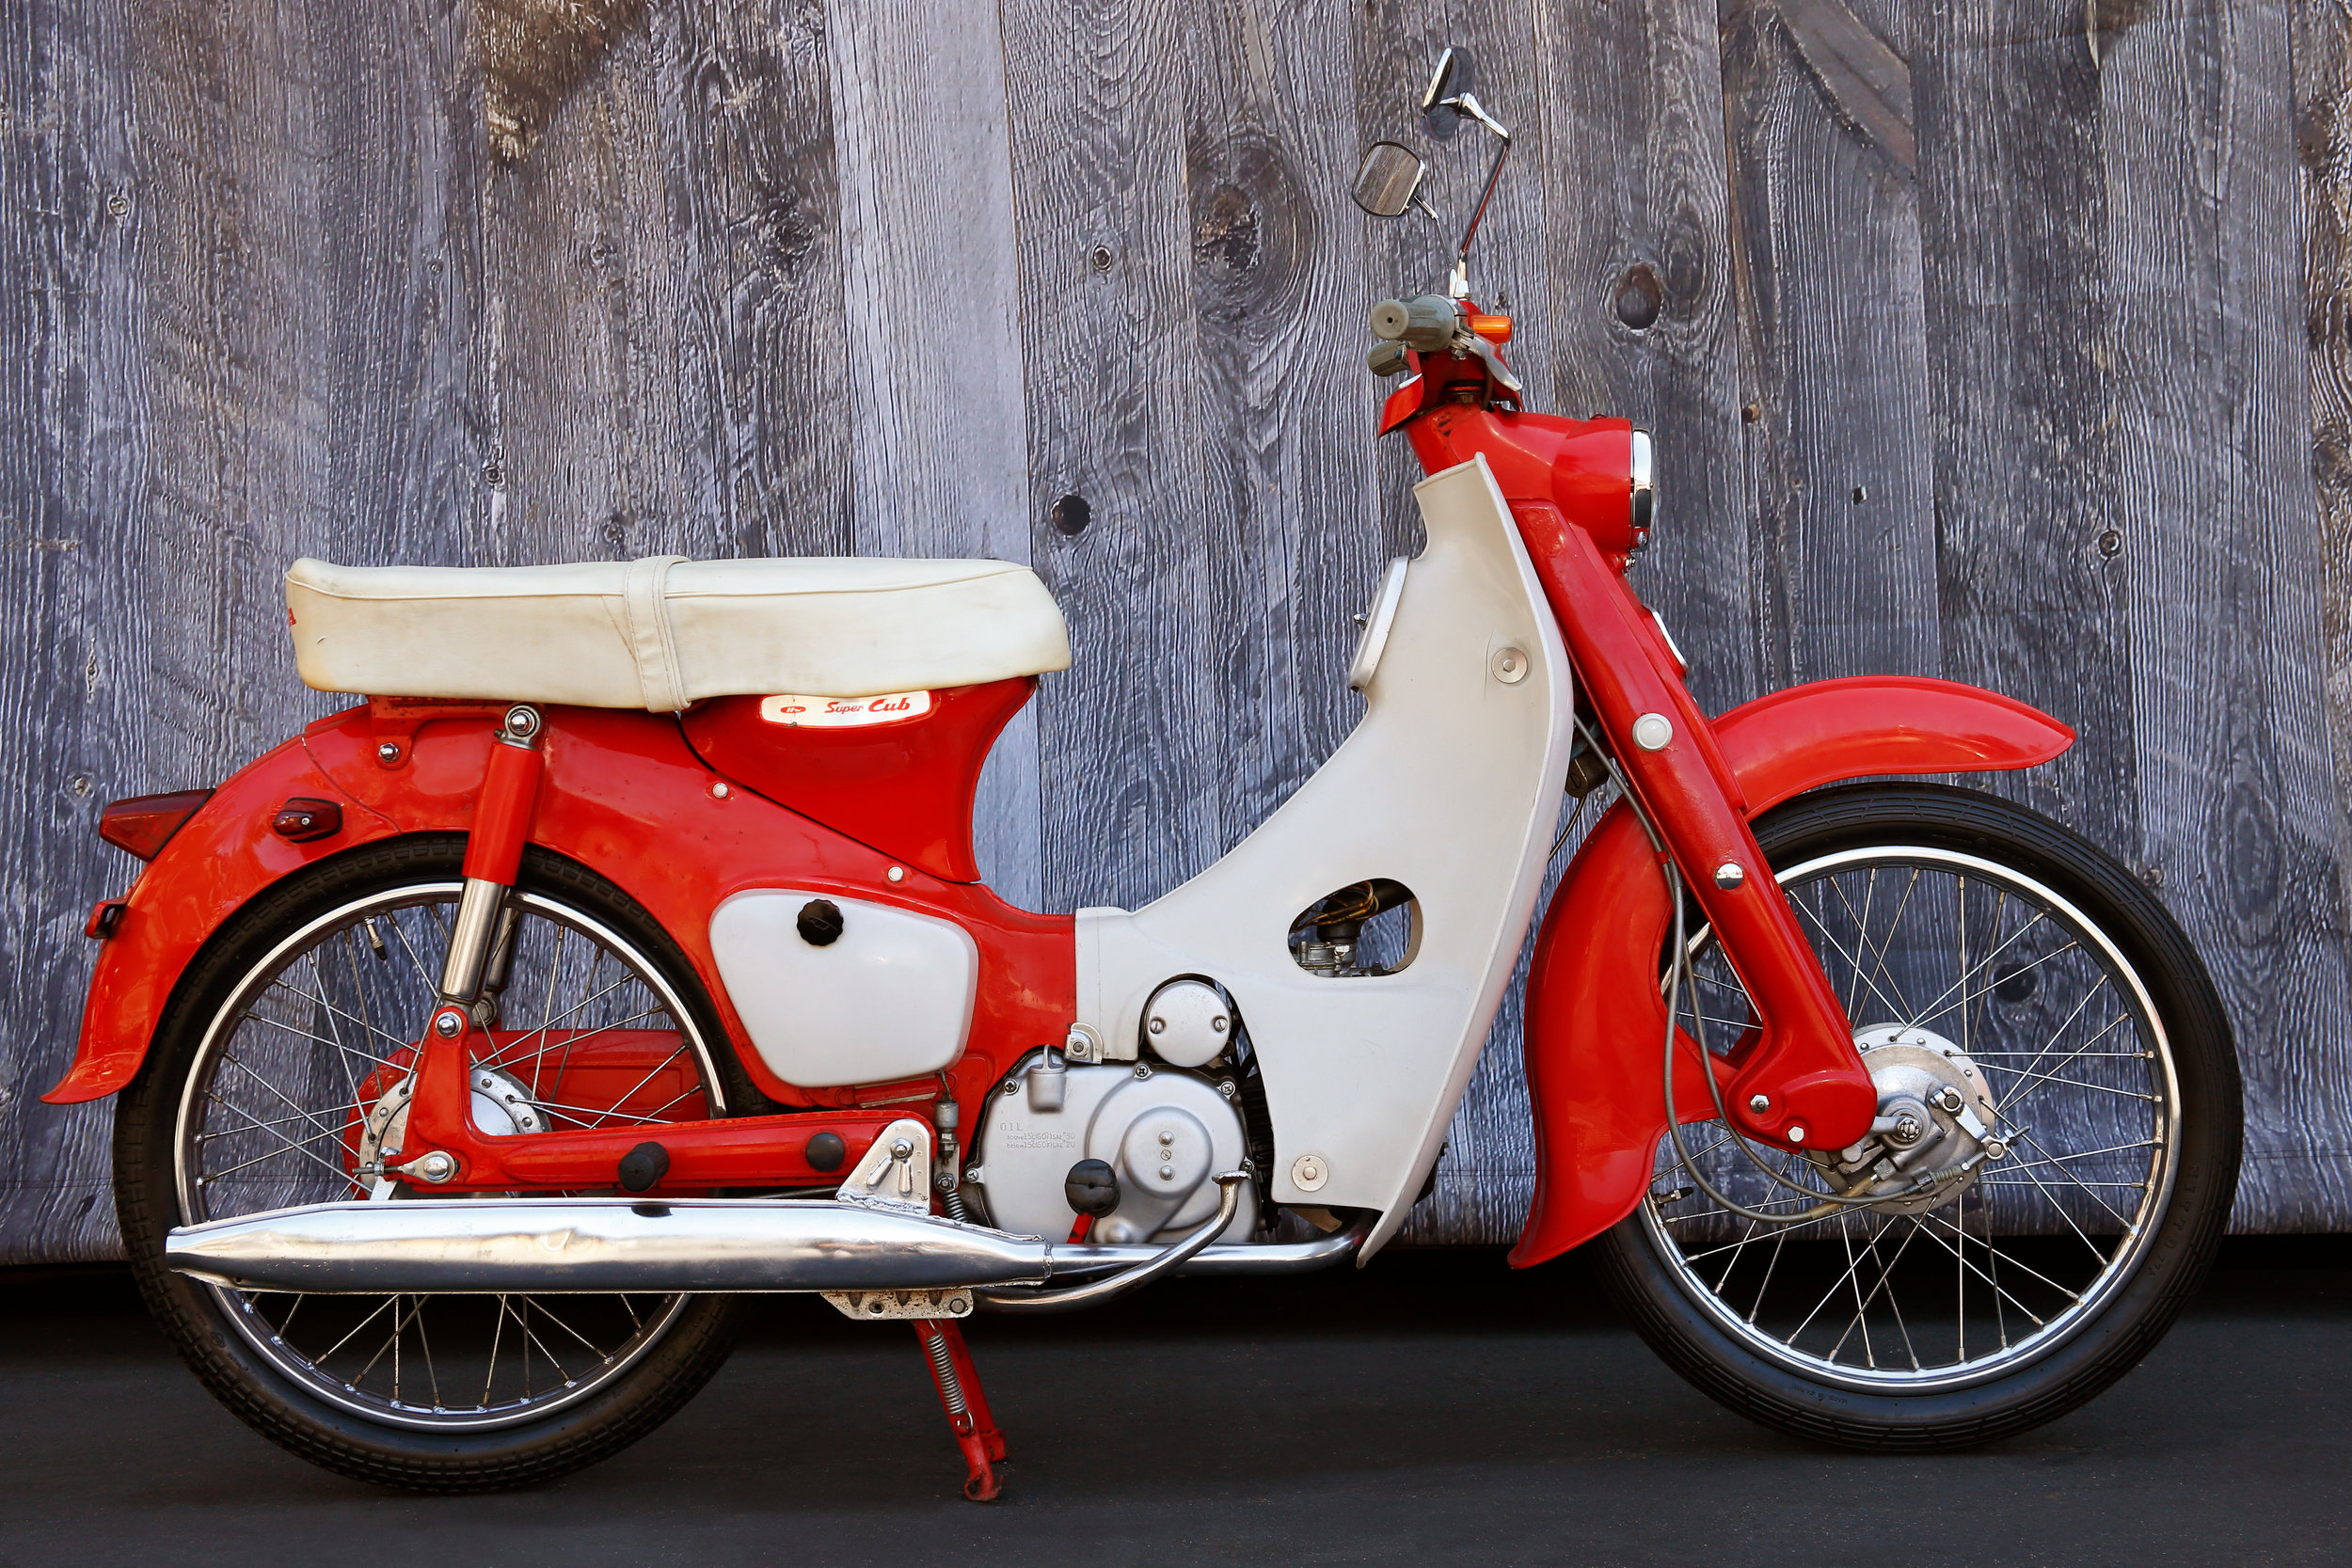 1959 Honda Super Cub 50 Model C102